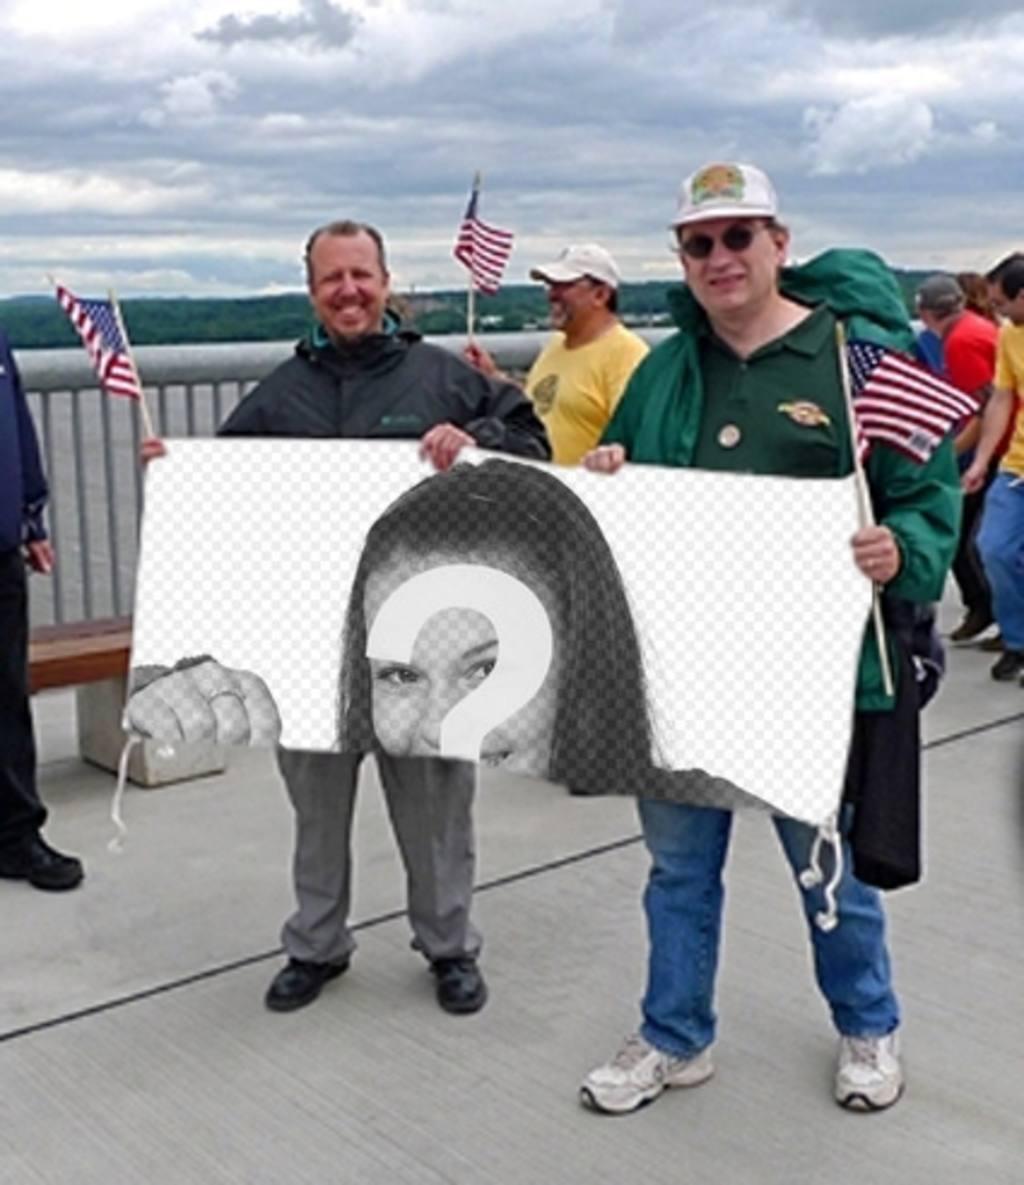 fotomontaje poner foto pancarta sujetando unos fans estados unidos